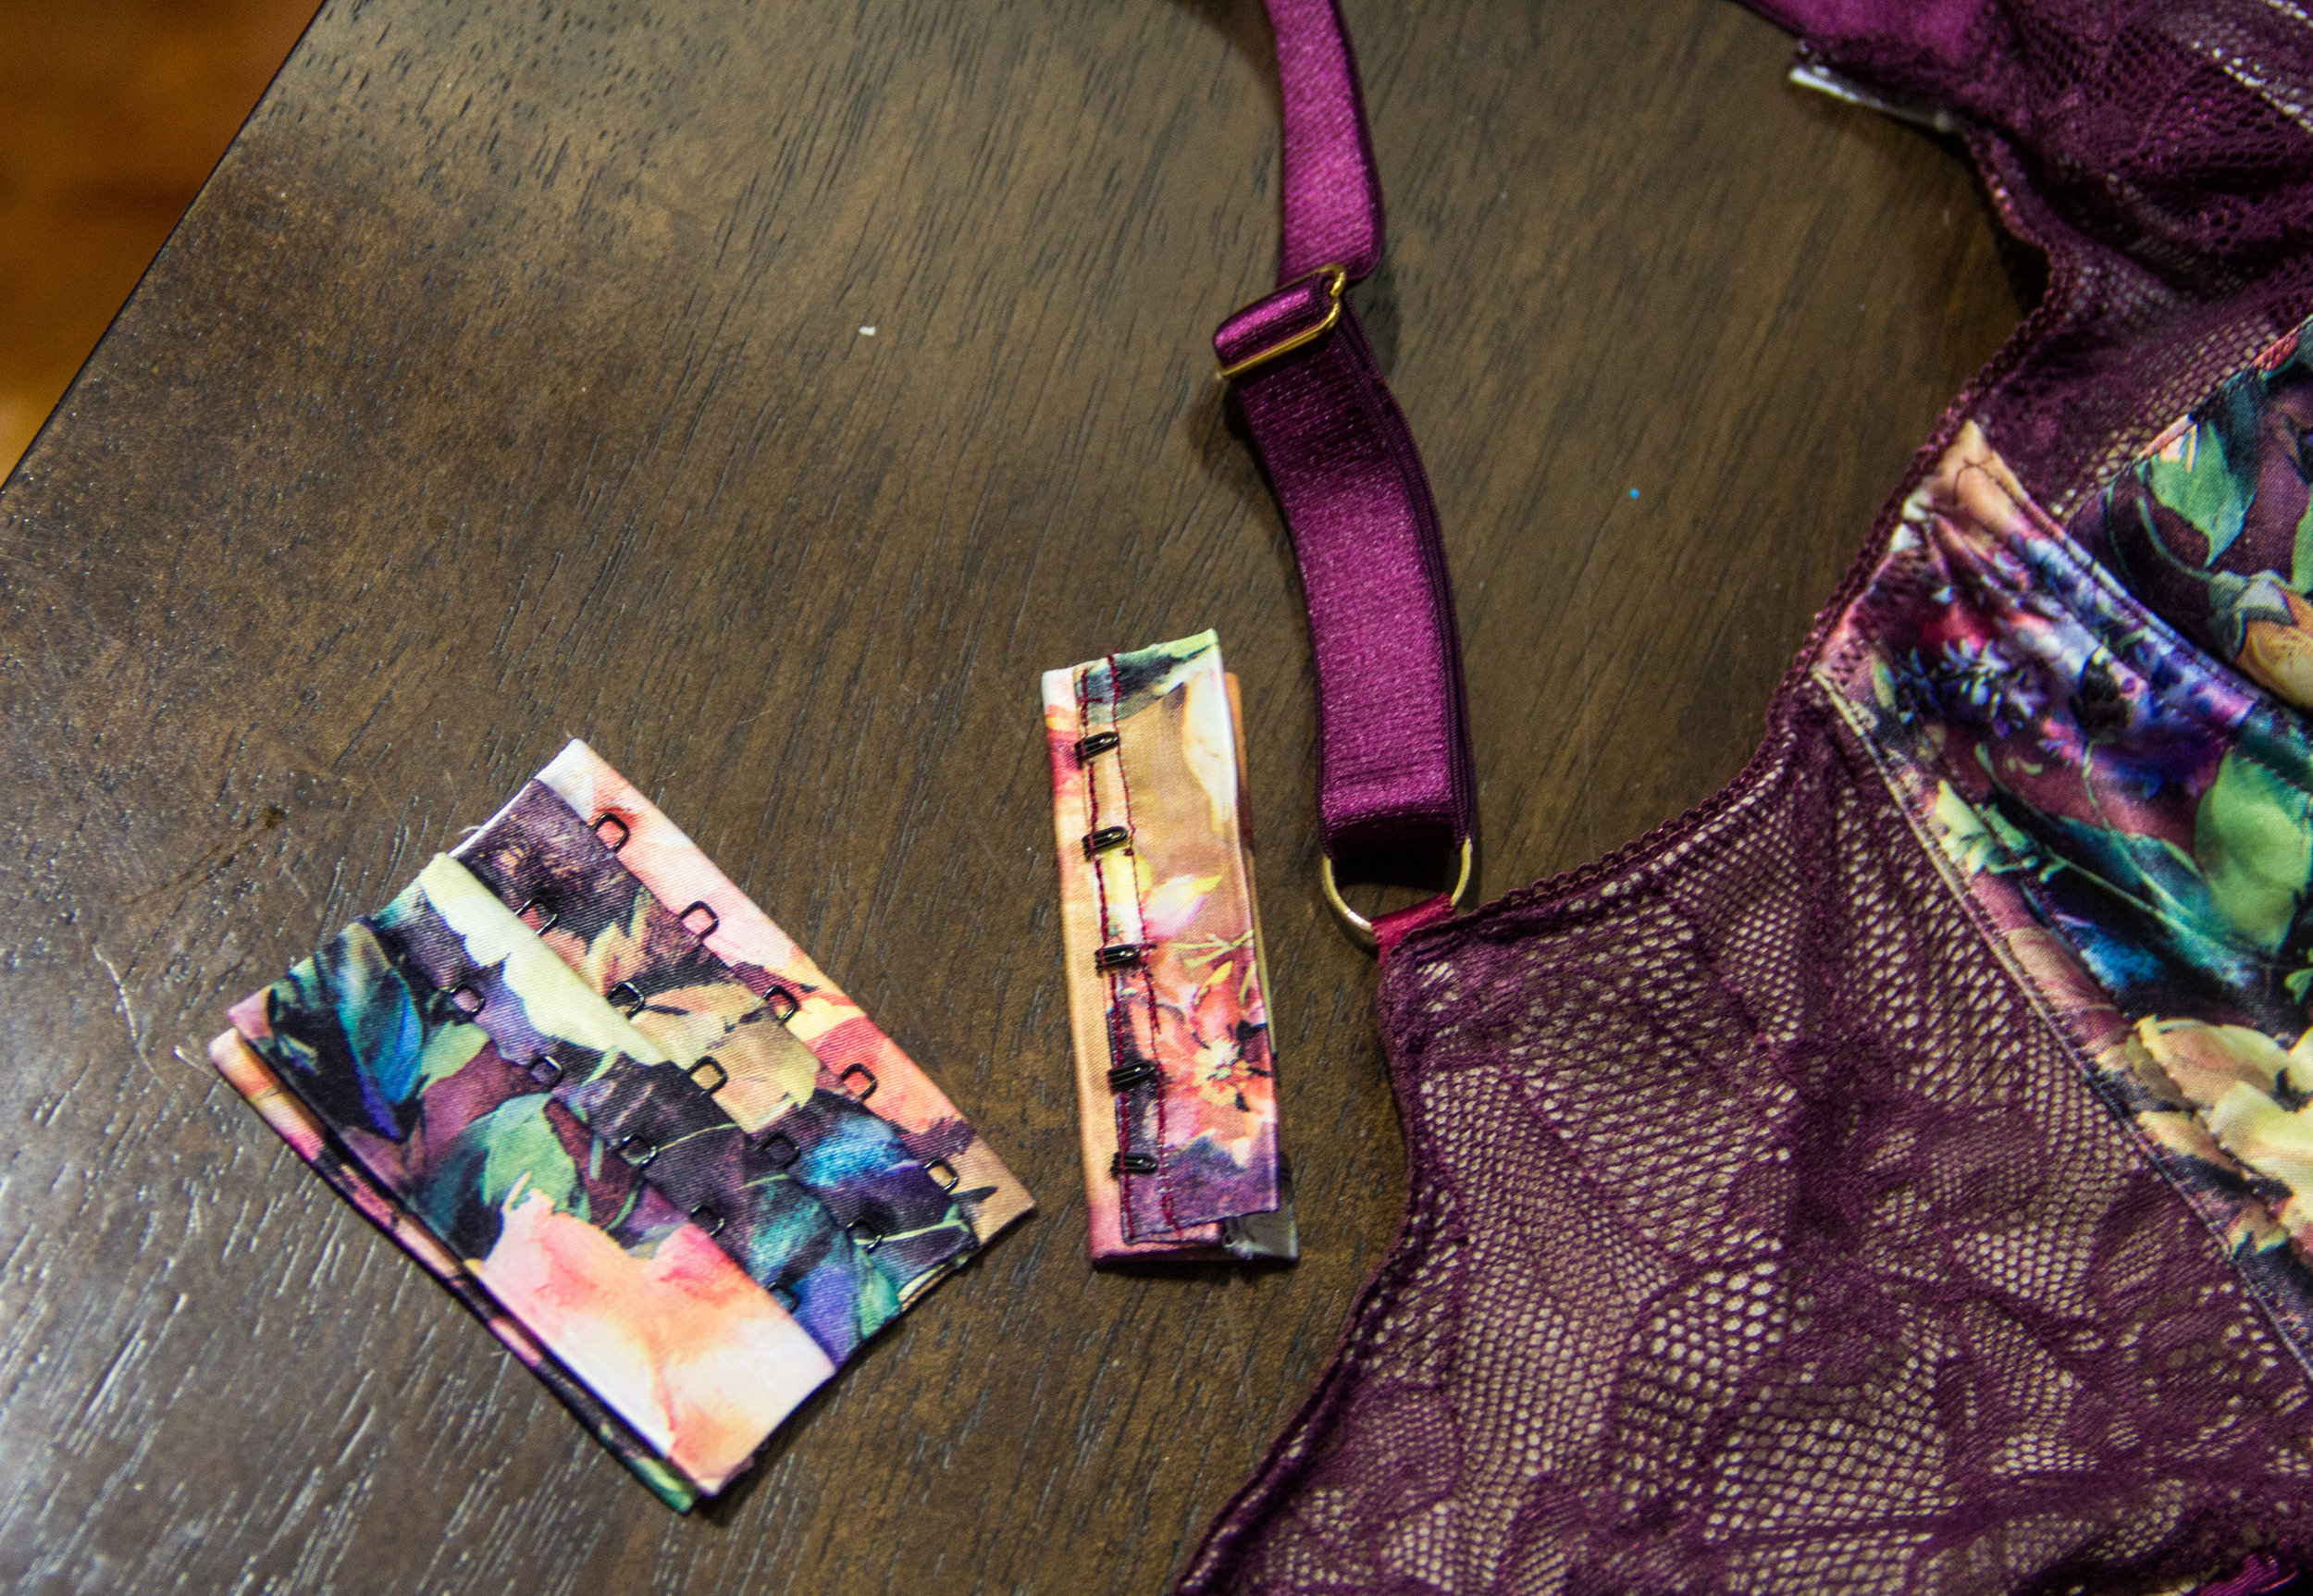 floral bra clasp for lace bustier detail